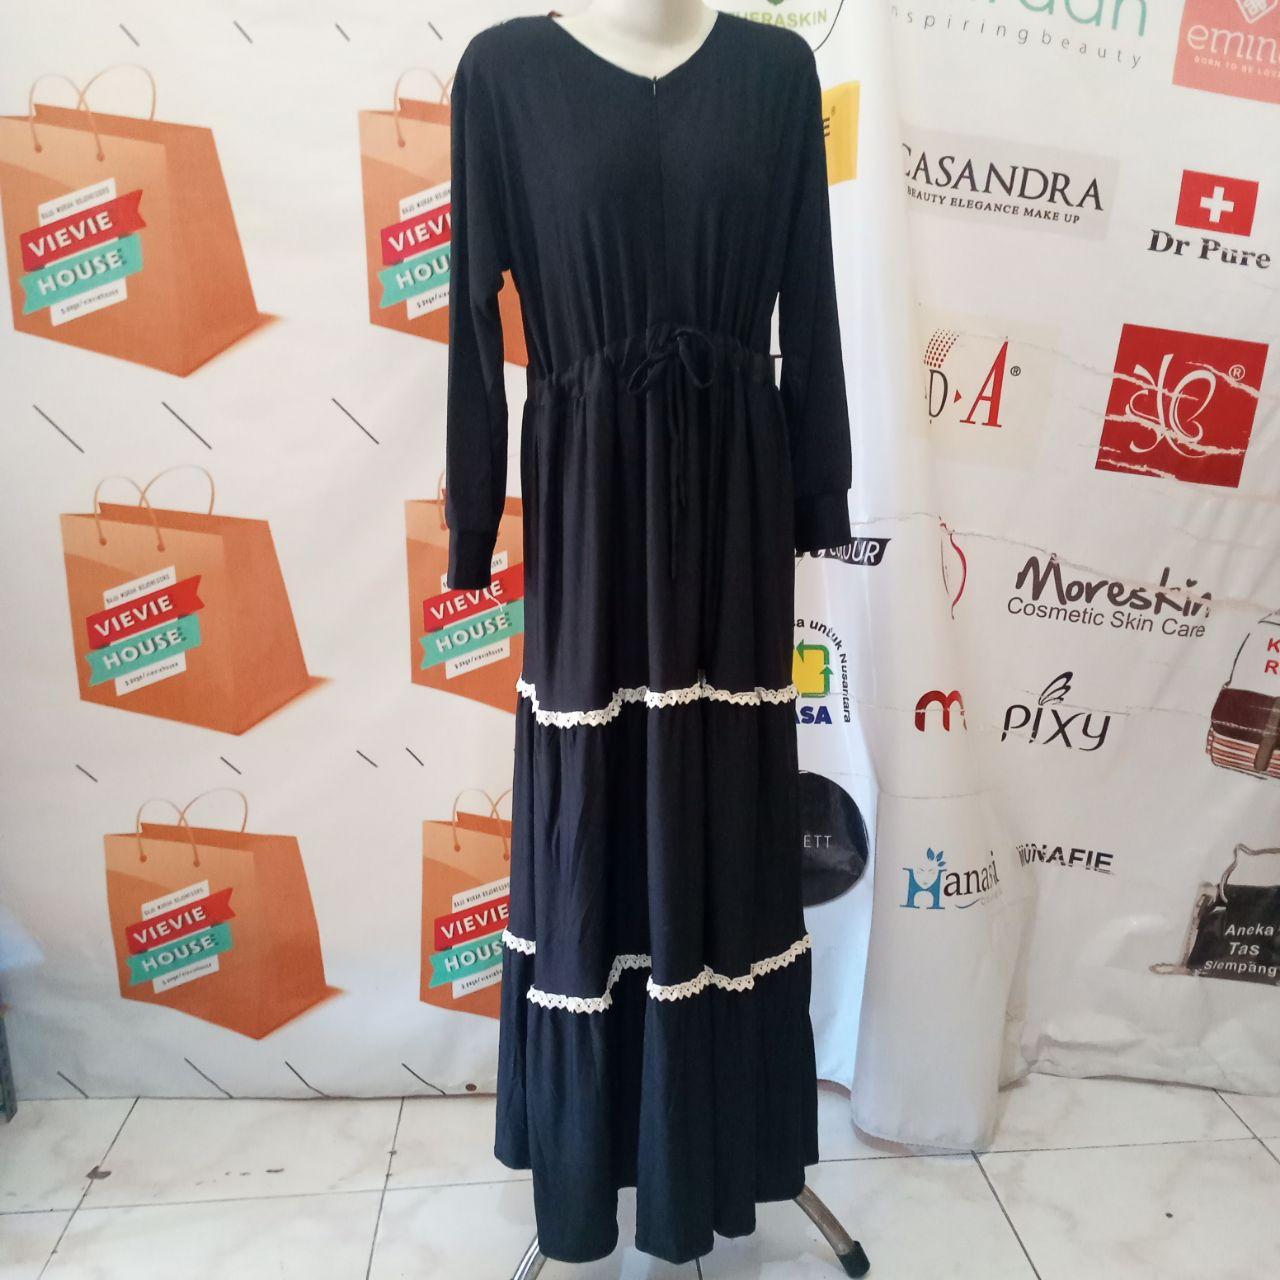 ini adalah Gamis Jersey Canda Hitam, size: 104 cm x 135 cm, material: Jersey, color: black, brand: Gamisindonesia, age_group: all ages, gender: female